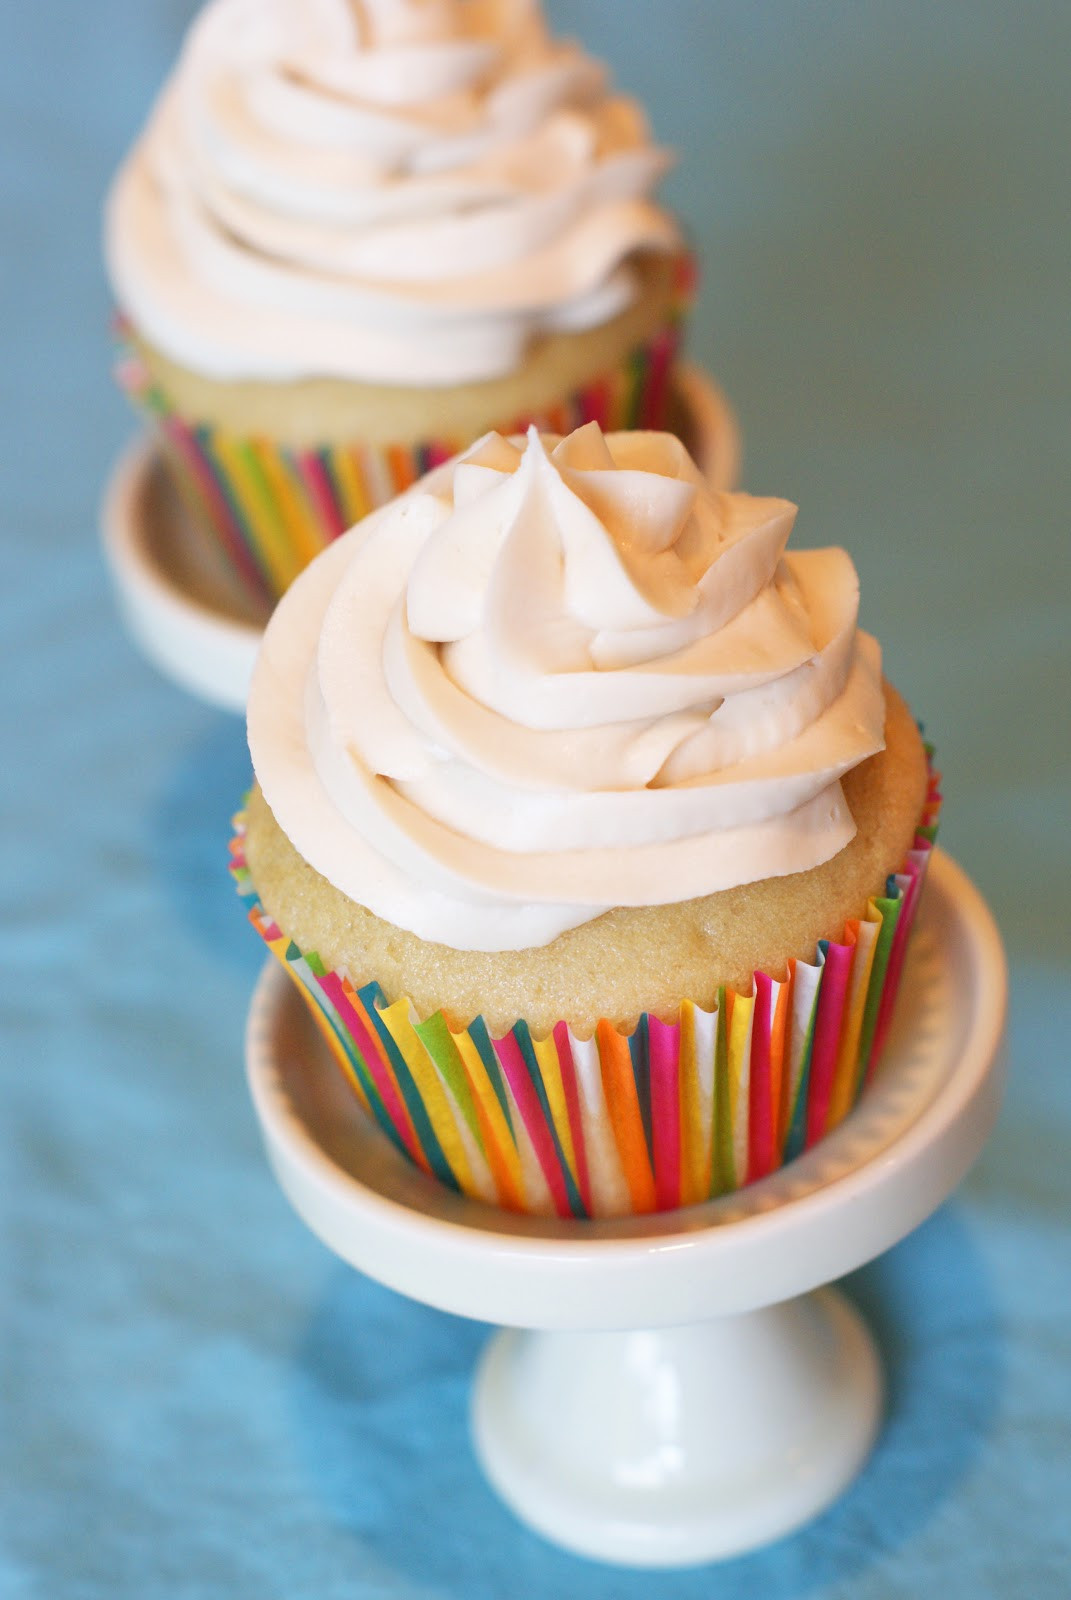 Vegan Vanilla Cupcakes  Sarah Bakes Gluten Free Treats gluten free vegan vanilla